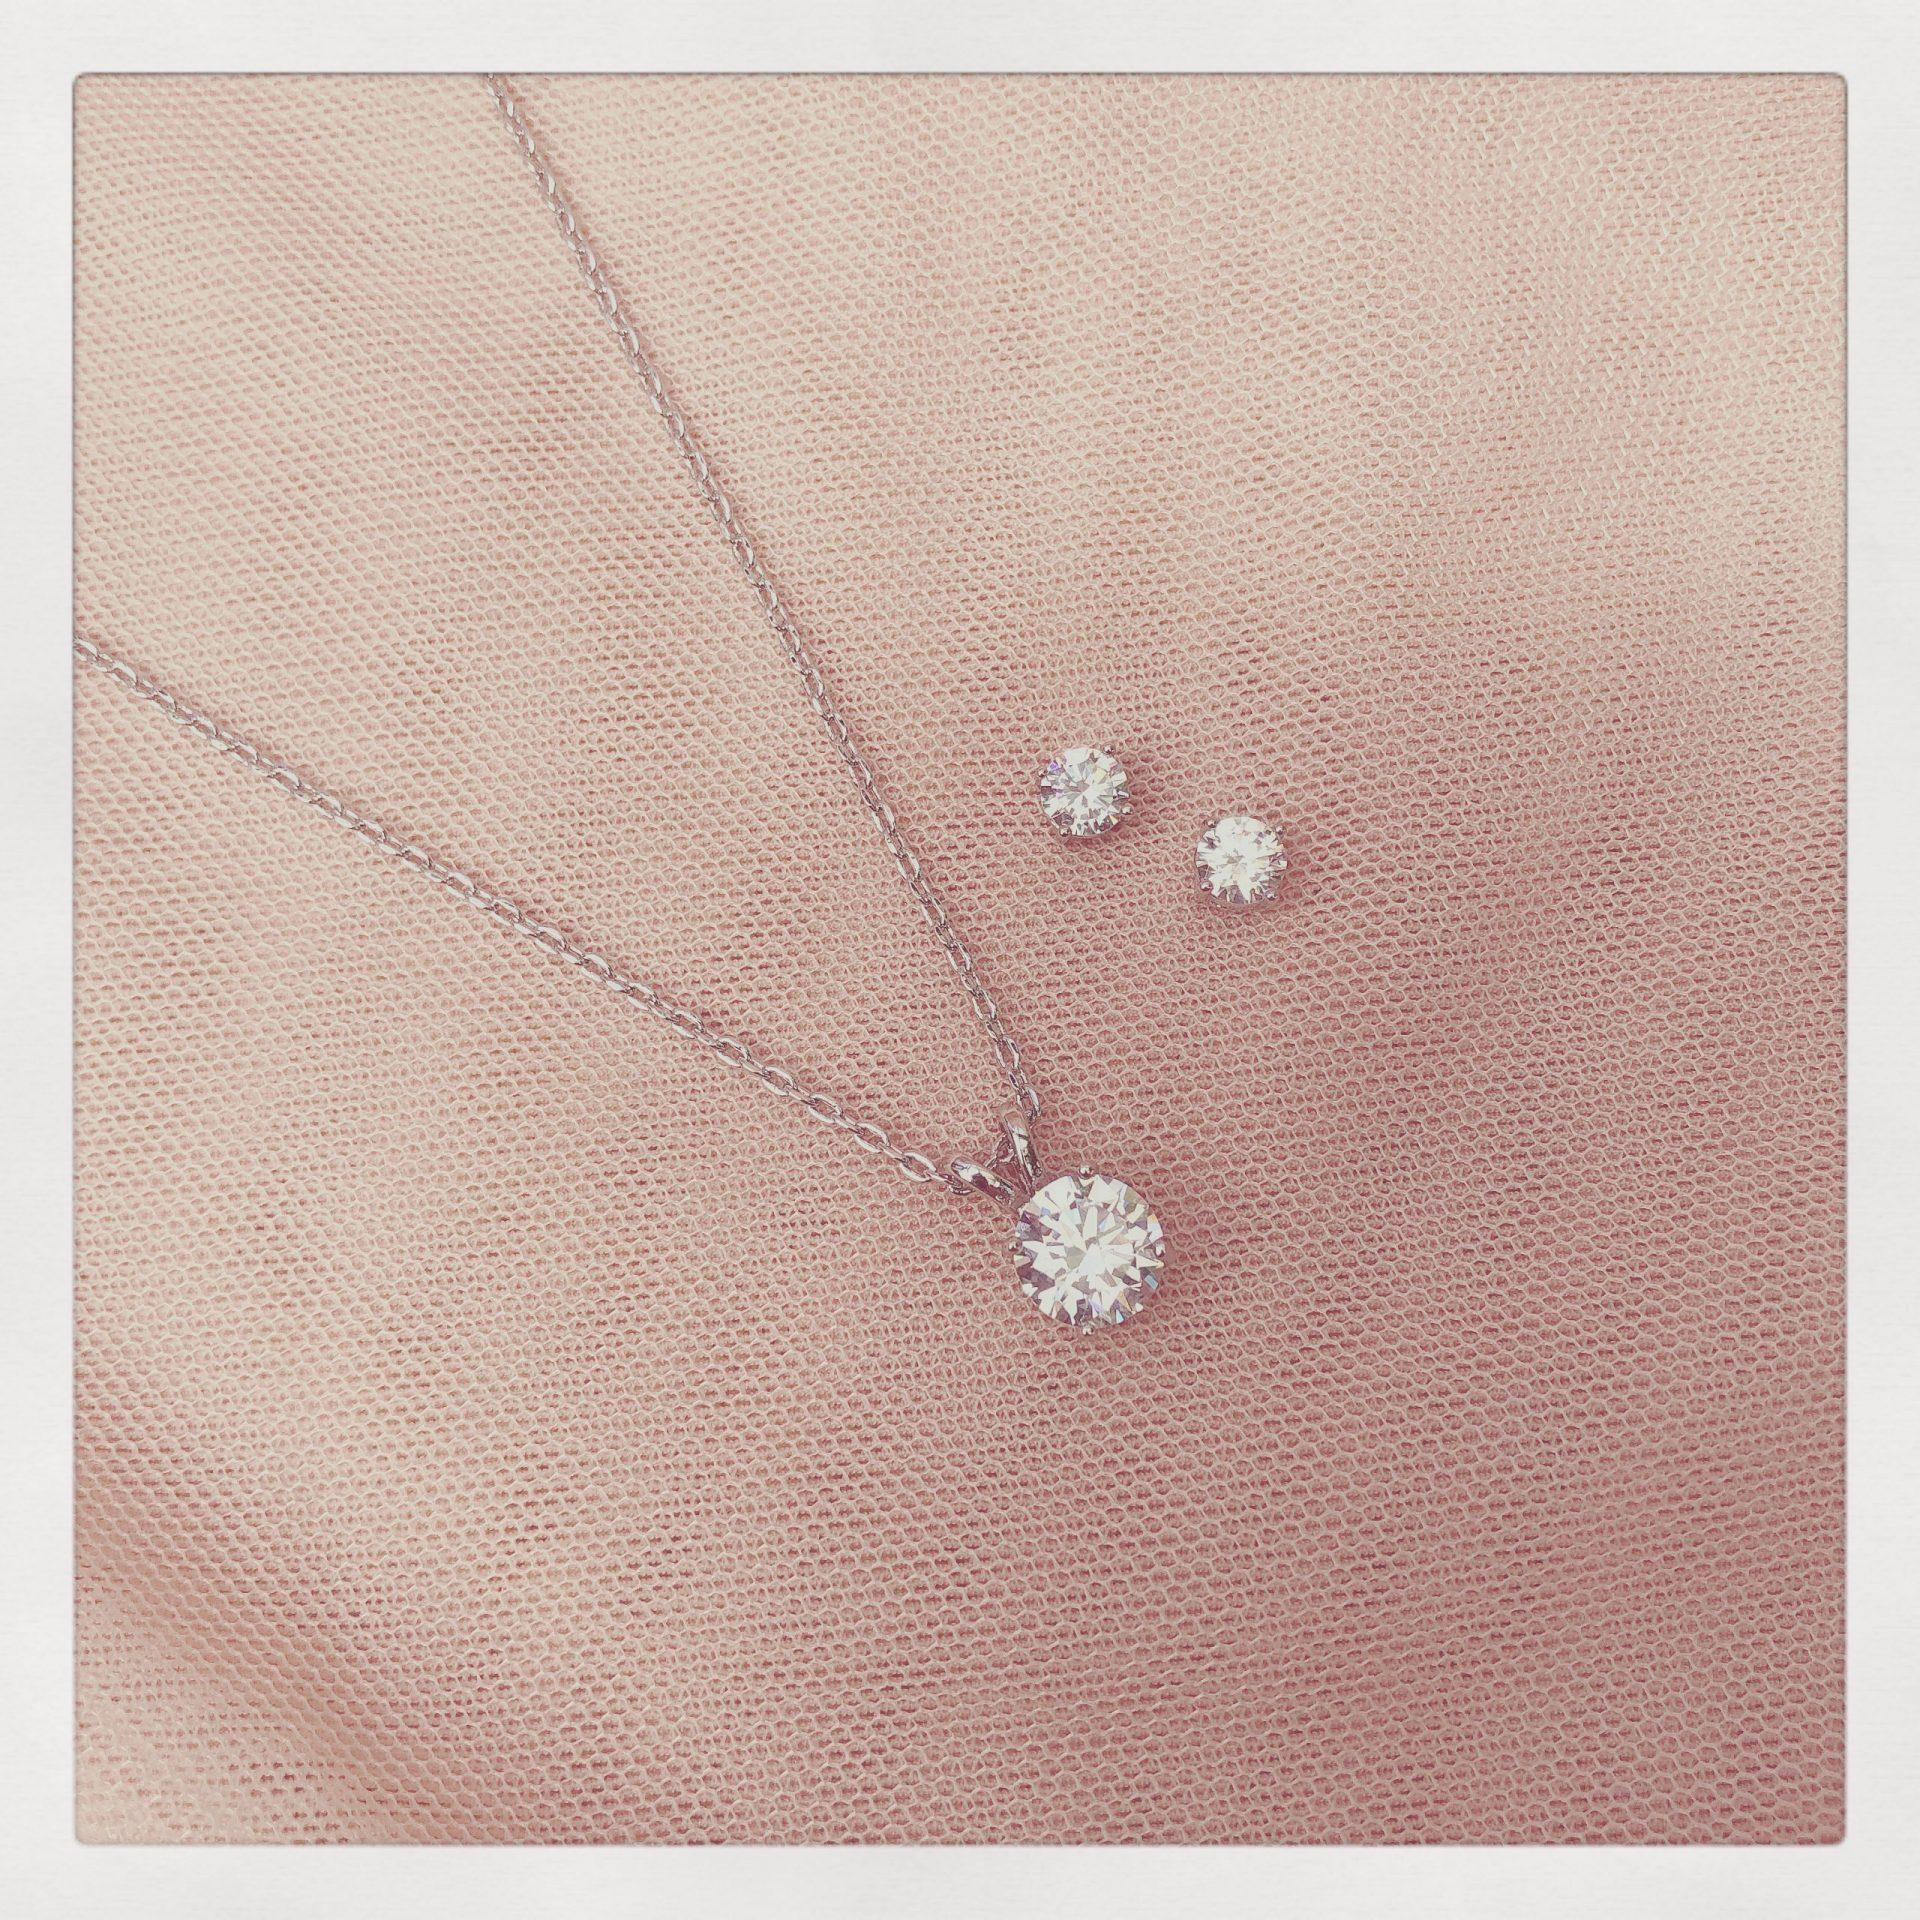 43. Cynthia – Jewellery Set